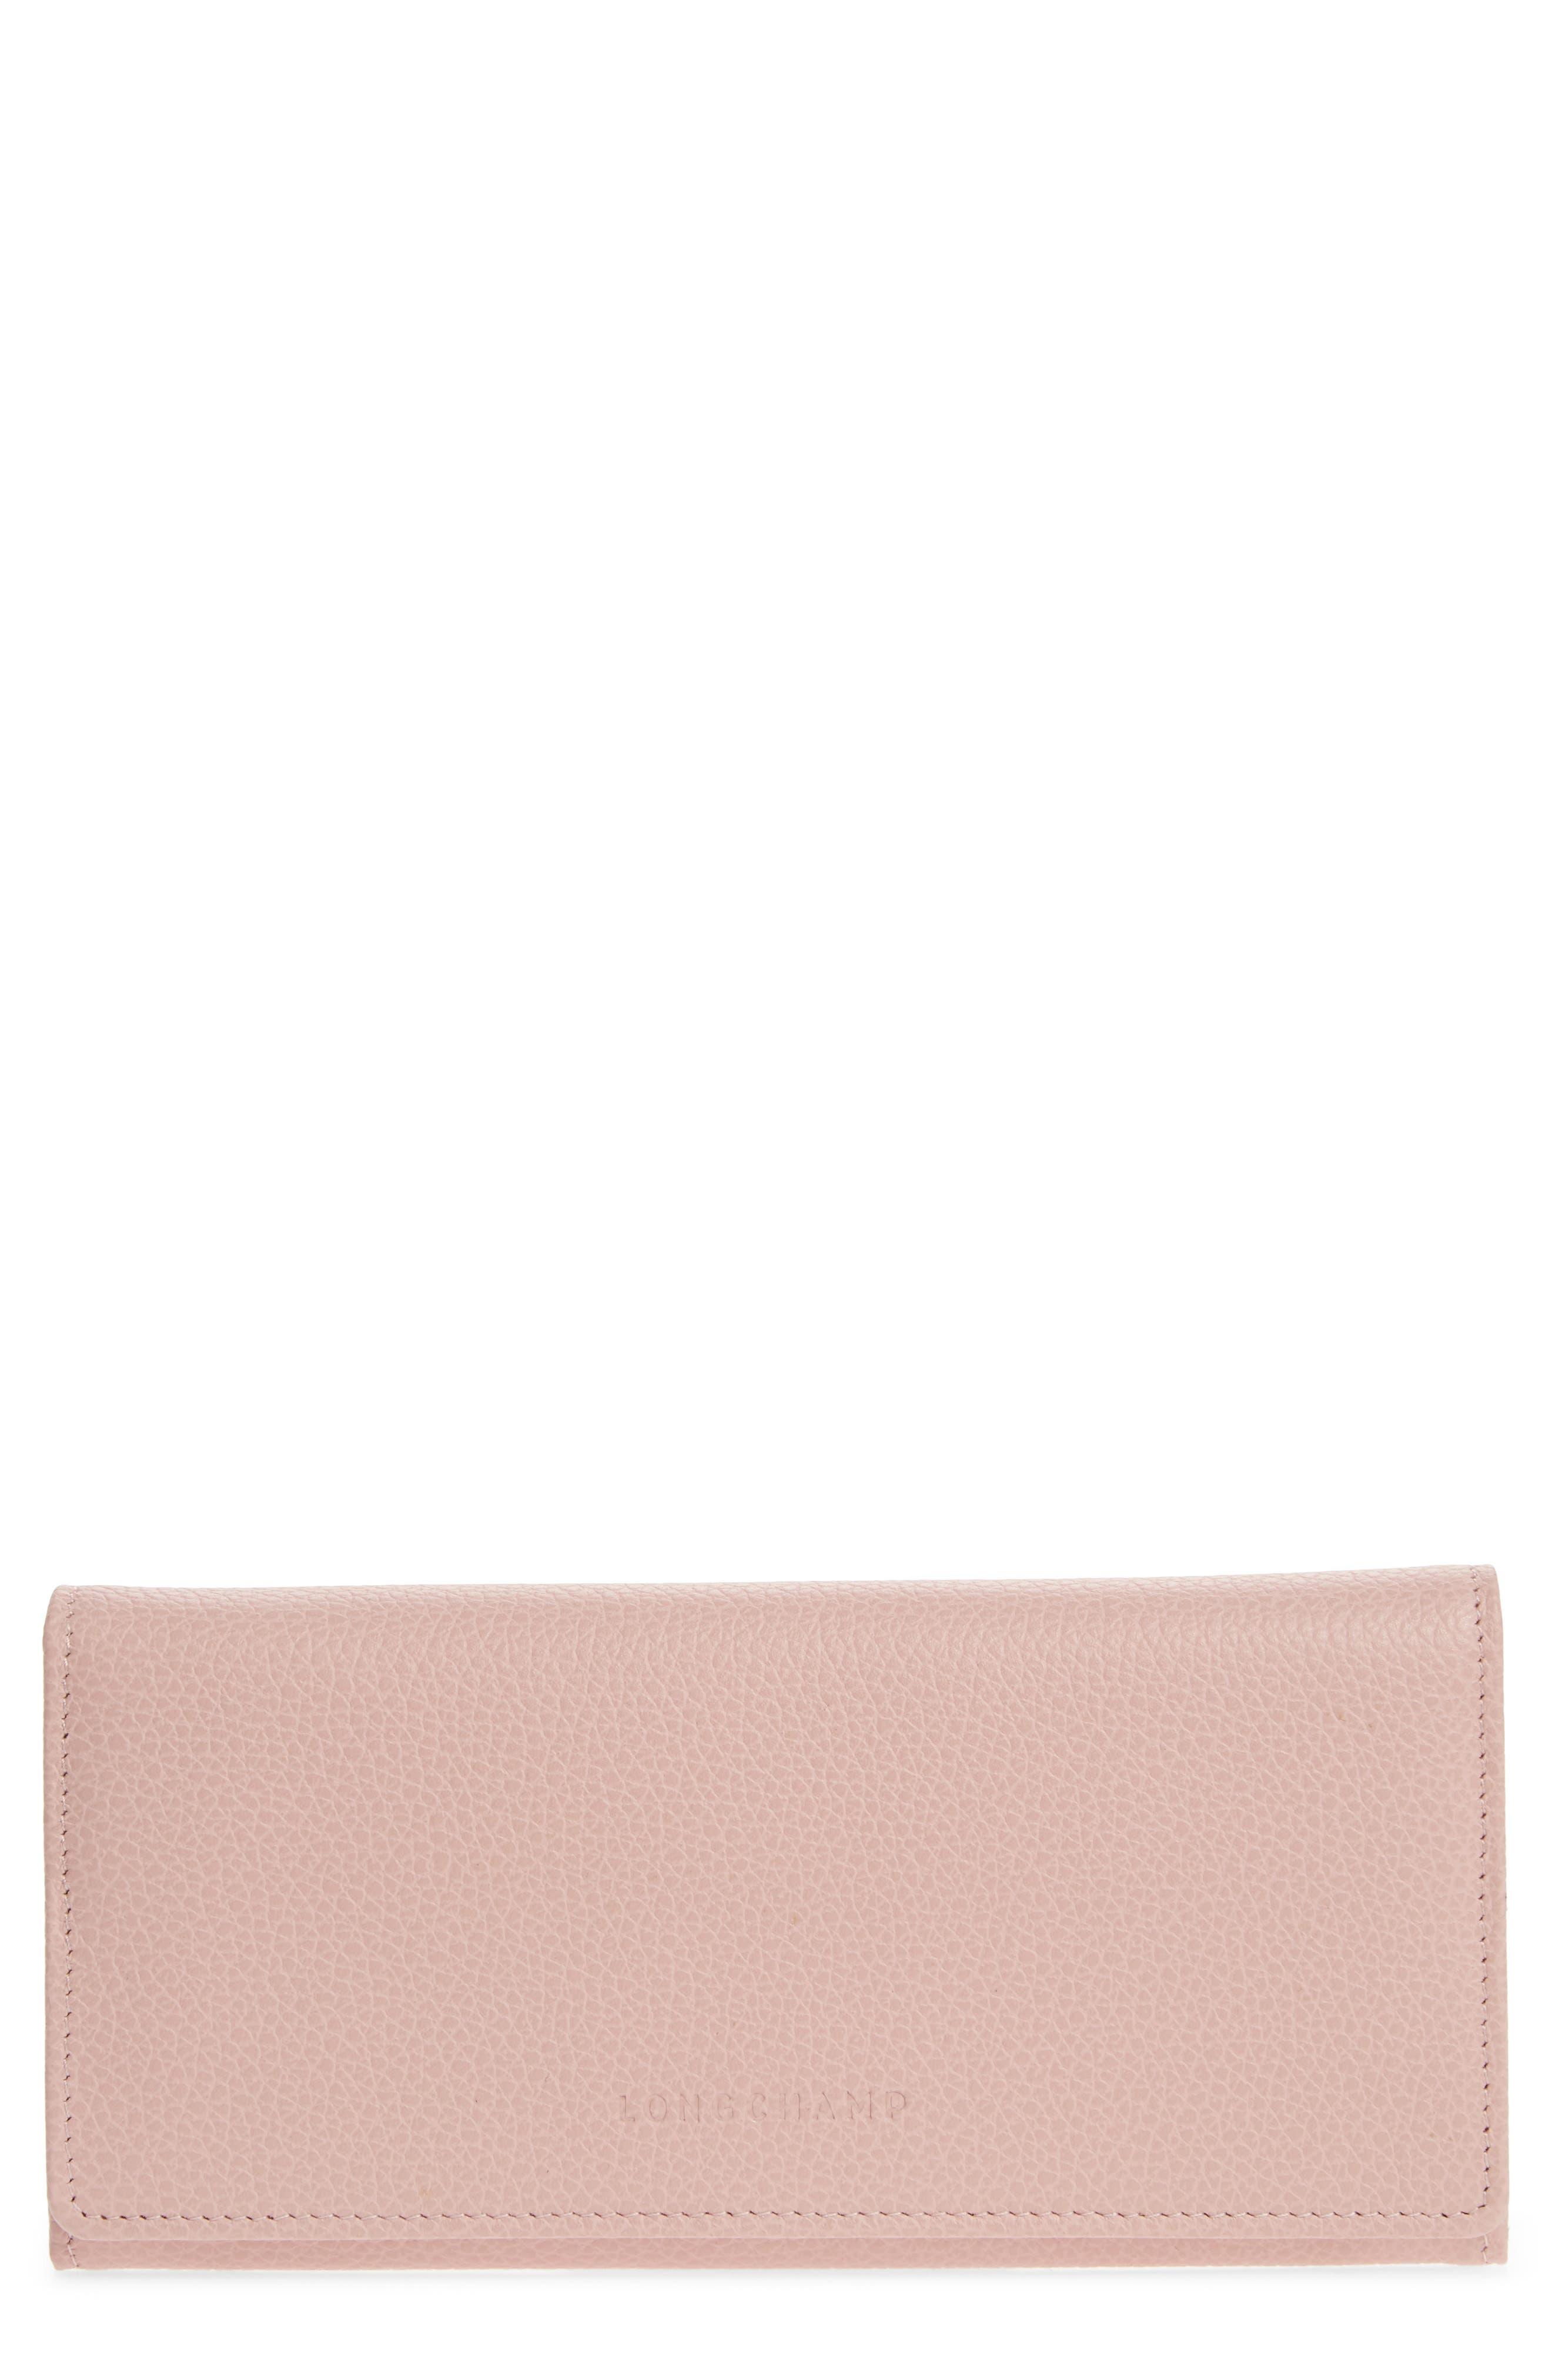 'Veau' Continental Wallet,                         Main,                         color, Powder